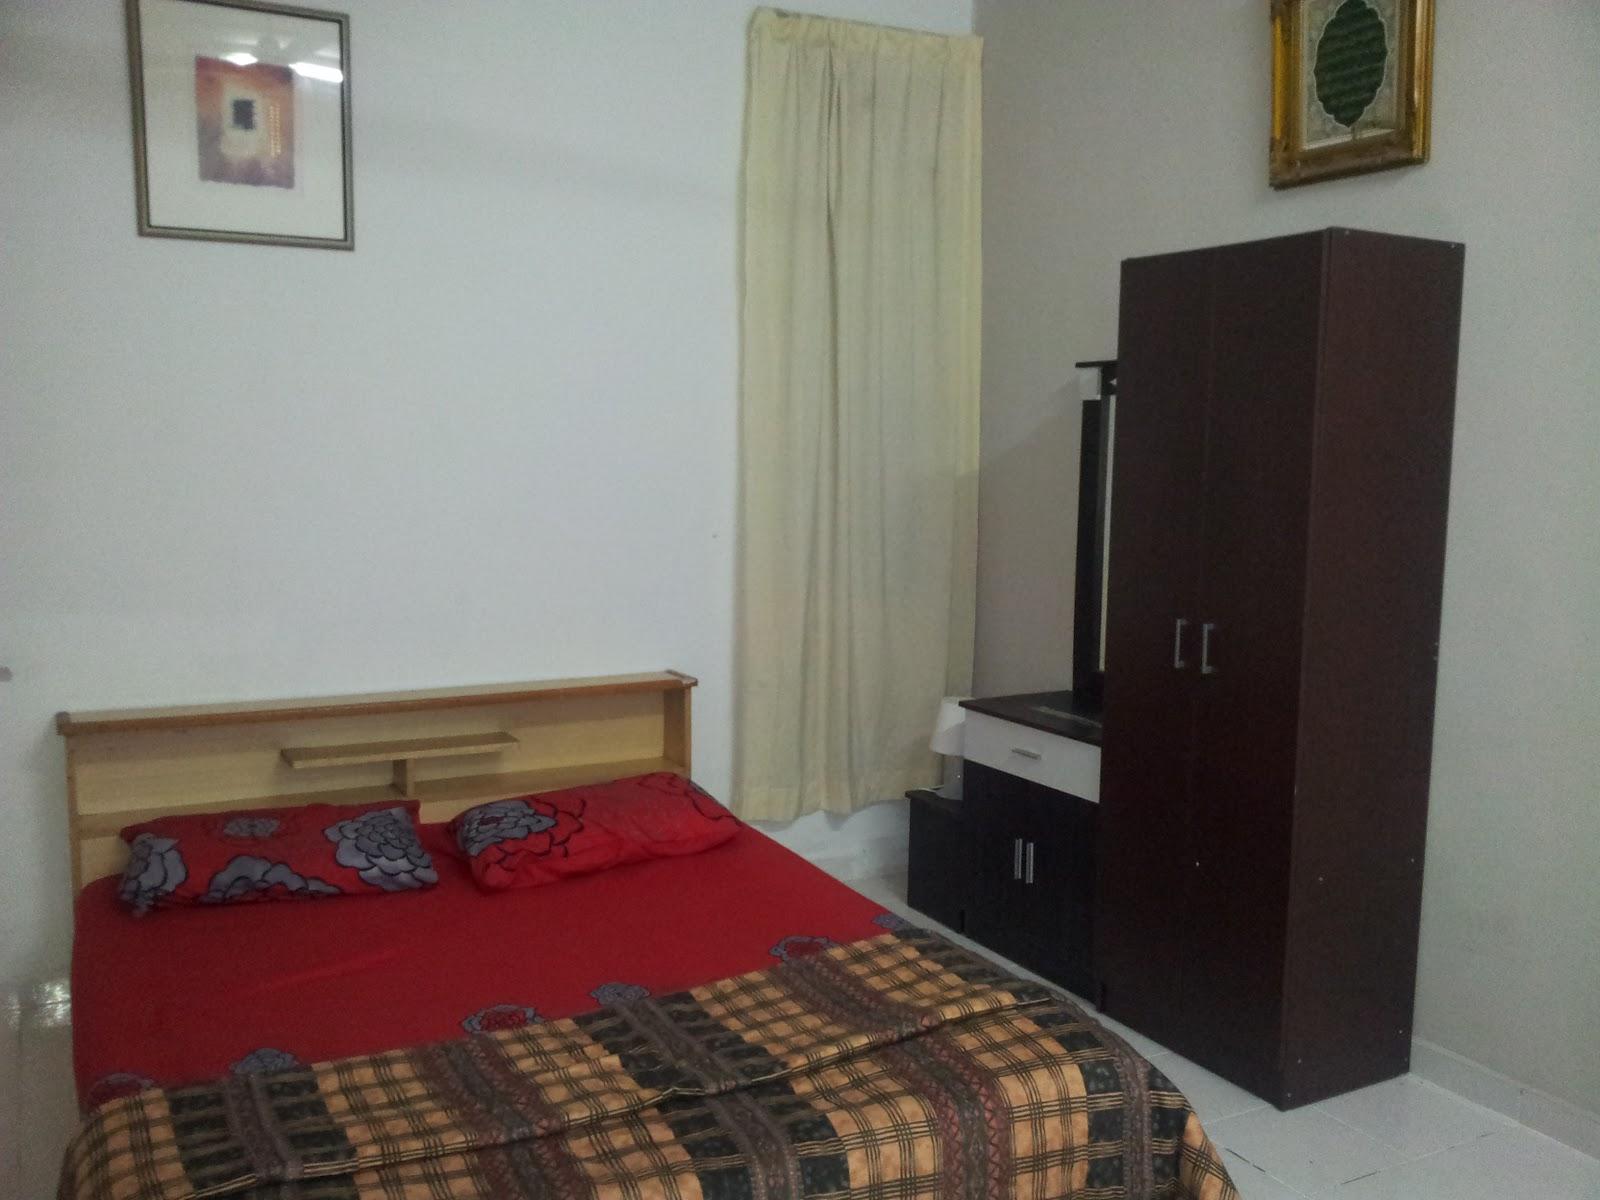 Nilai budget homestay homestay familia de casa - Master bedroom study table ...